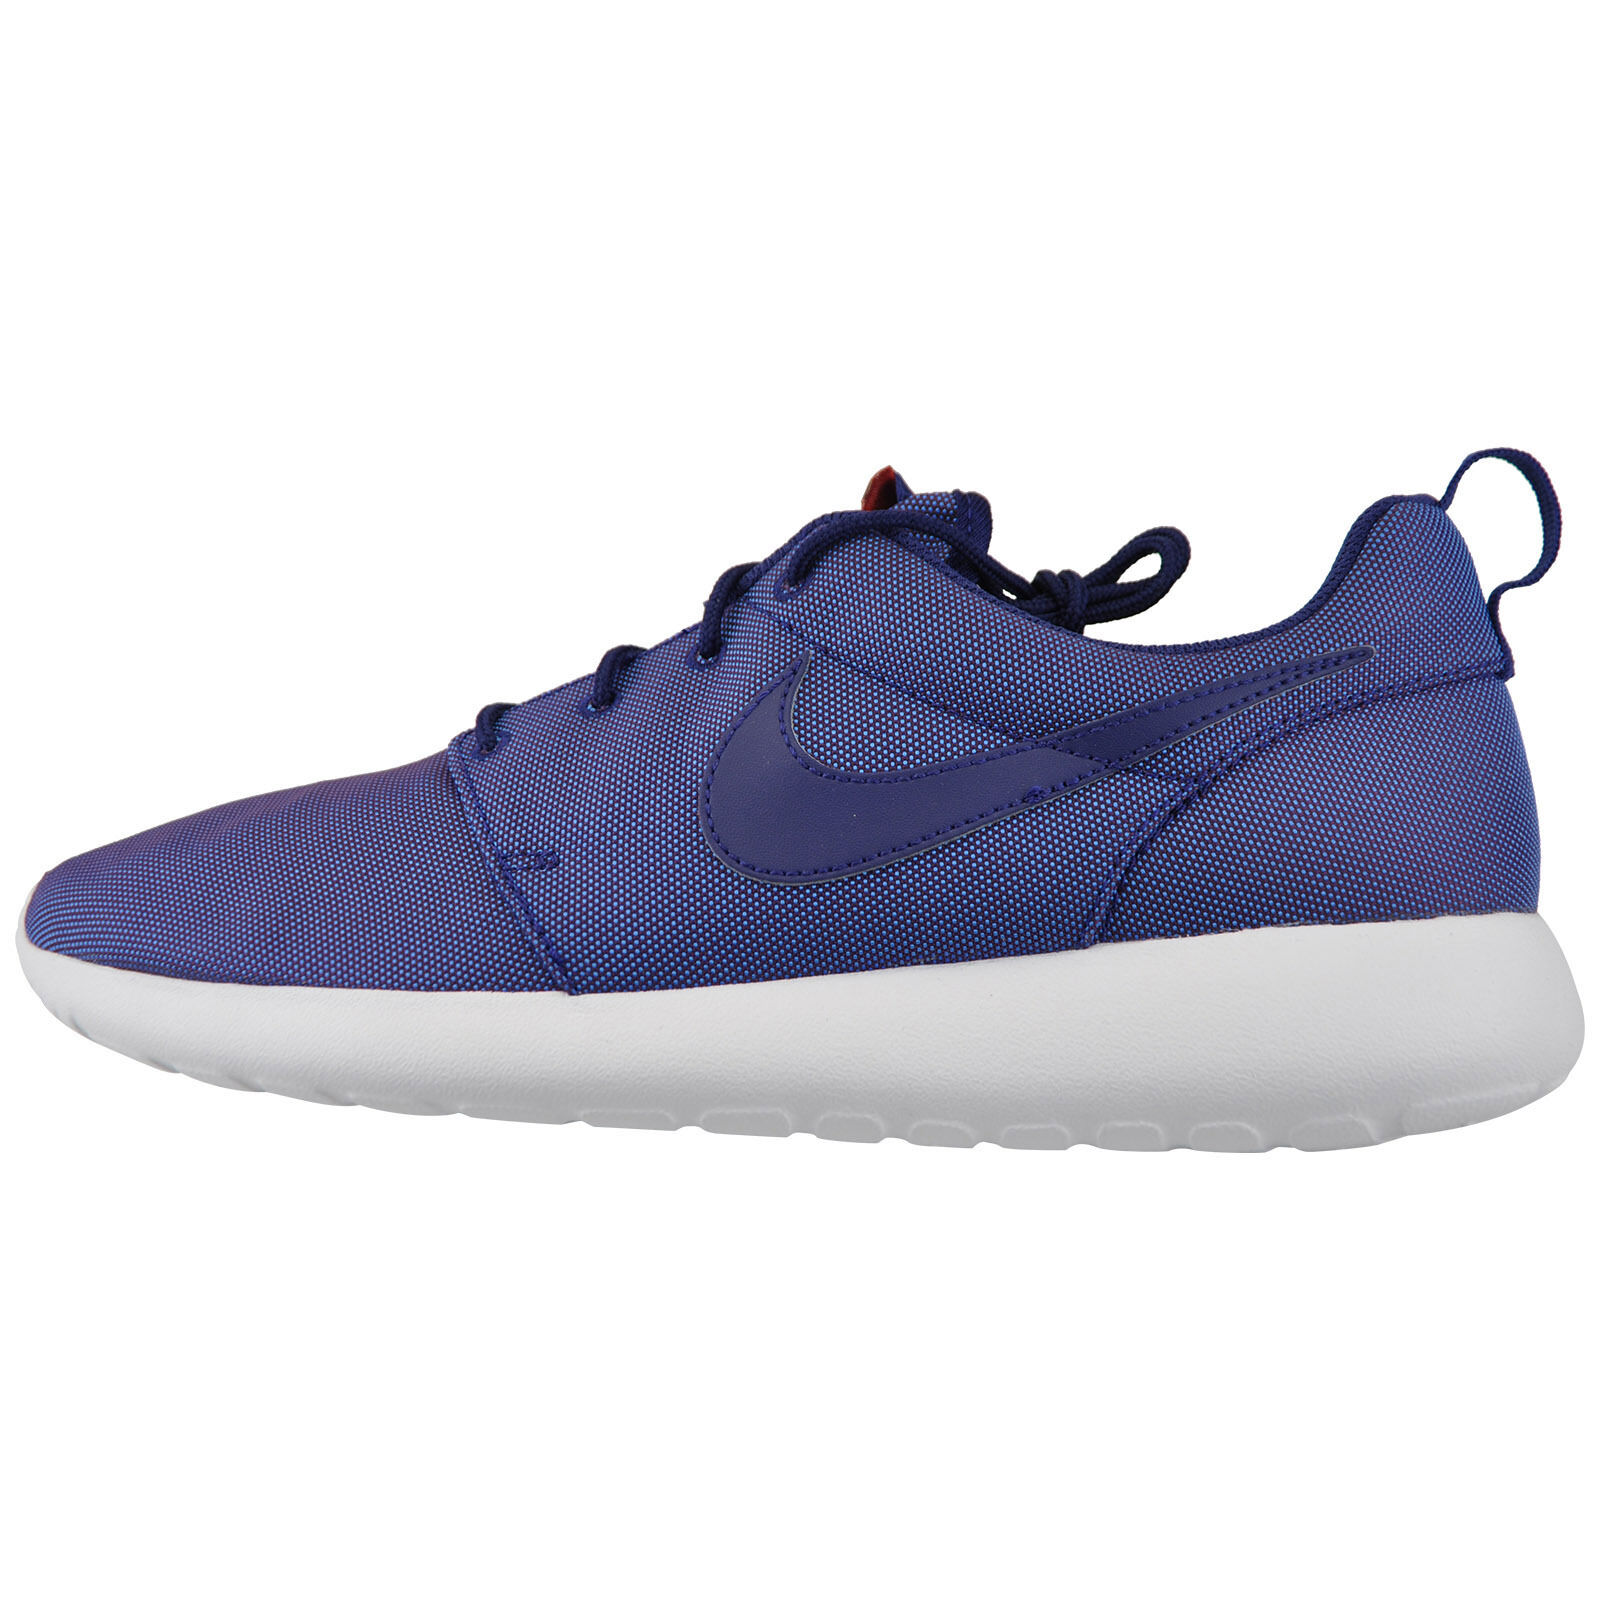 Nike Roshe One Premium 525234-442 Running Jogging Laufschuhe Freizeit Sneaker